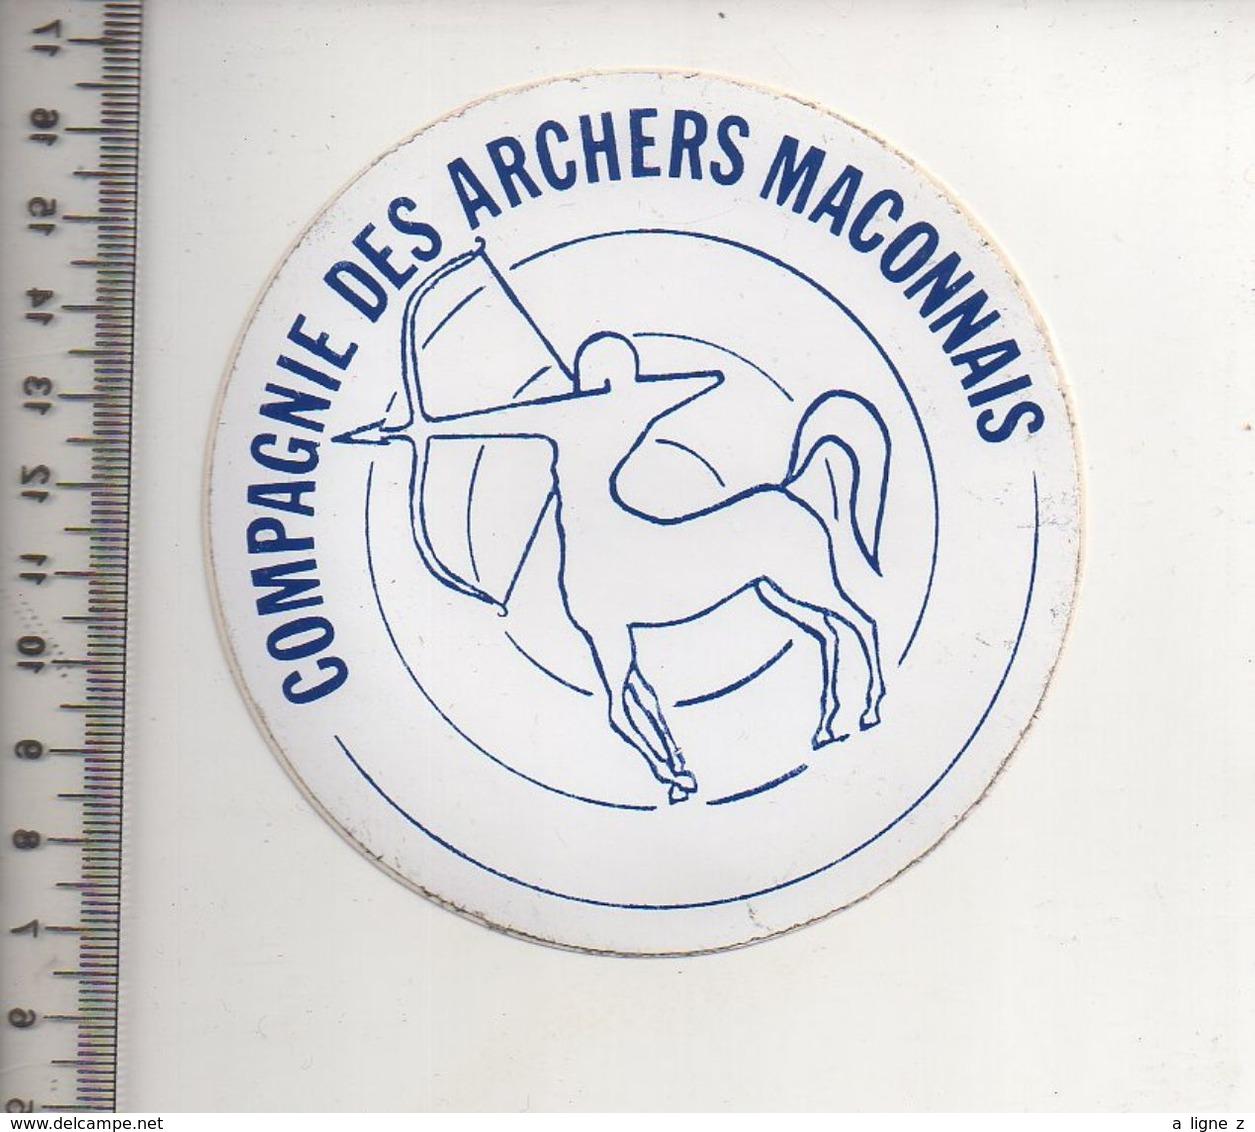 REF 10 : Autocollant Sticker Thème TIR A L'ARC Archerie Archer Compagnie Club Macon Maconnais - Tiro Con L'Arco